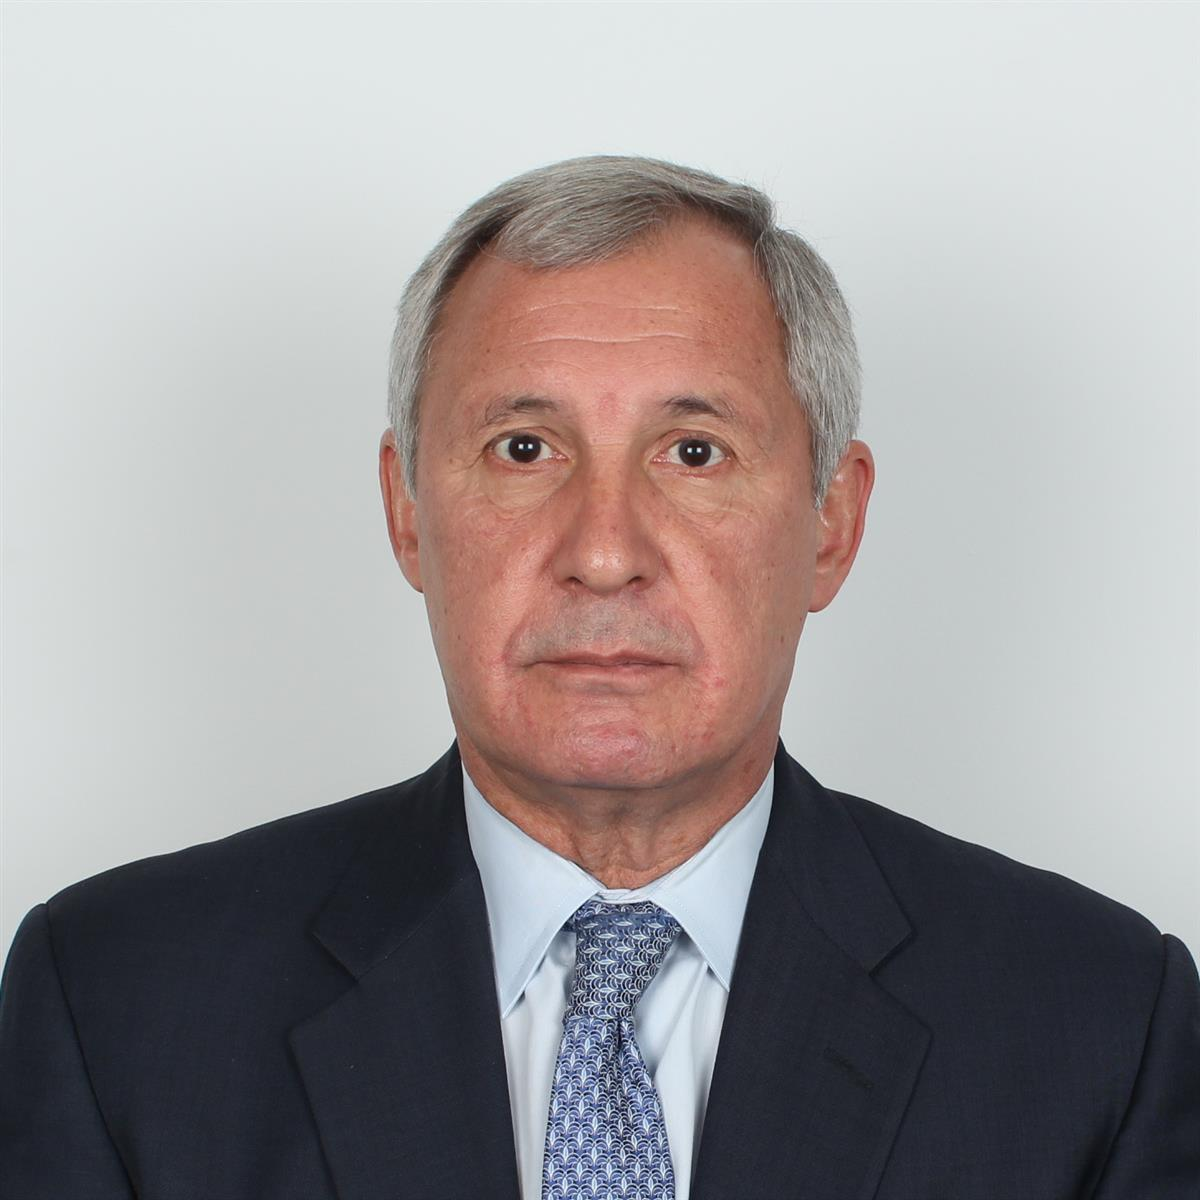 Mr. Alexander Trepelkov